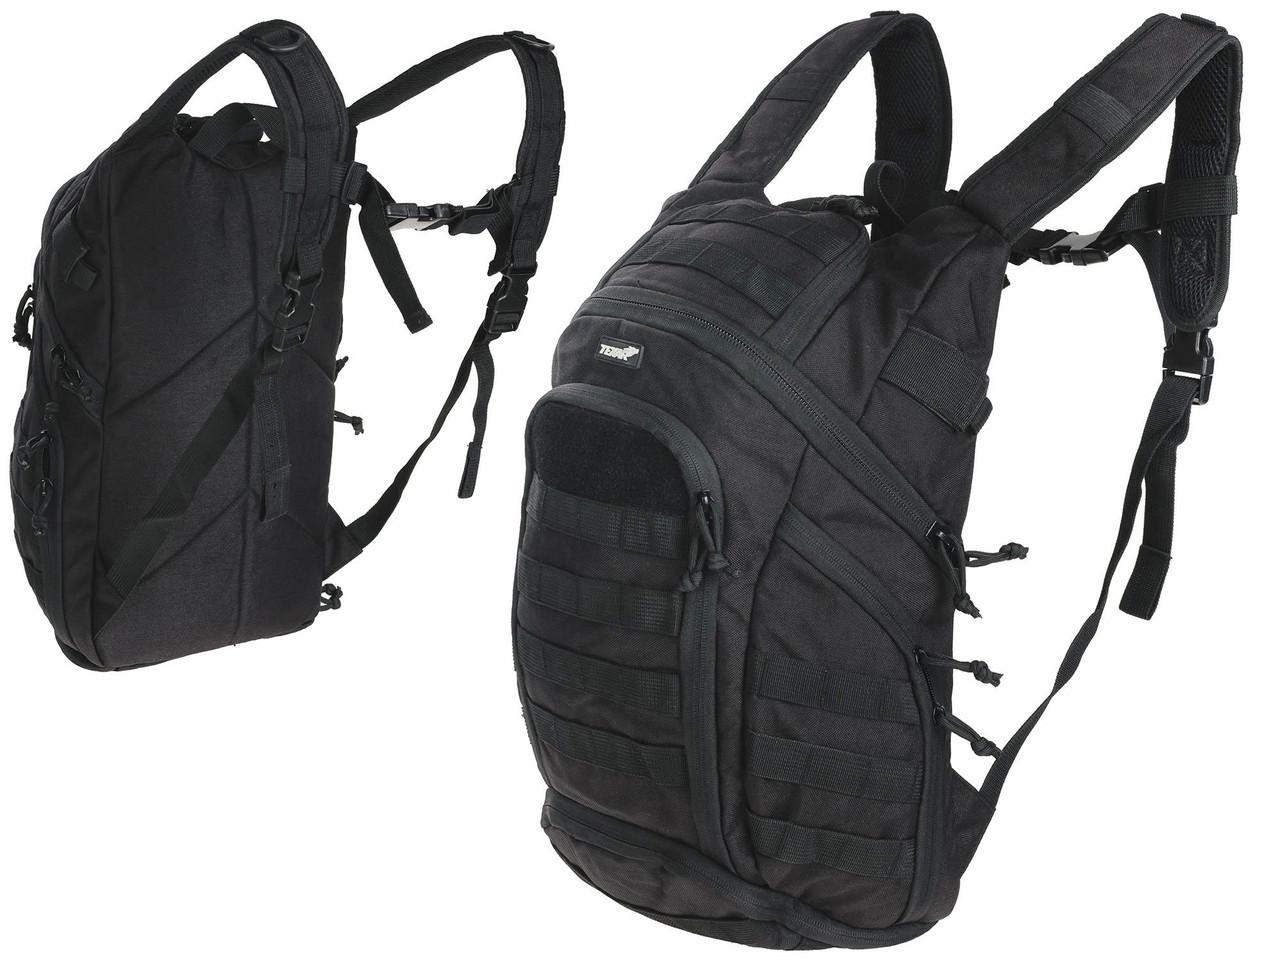 3c32d95110c8 Тактический рюкзак TEXAR COBER BACKPACK 20-40L черный - ПП